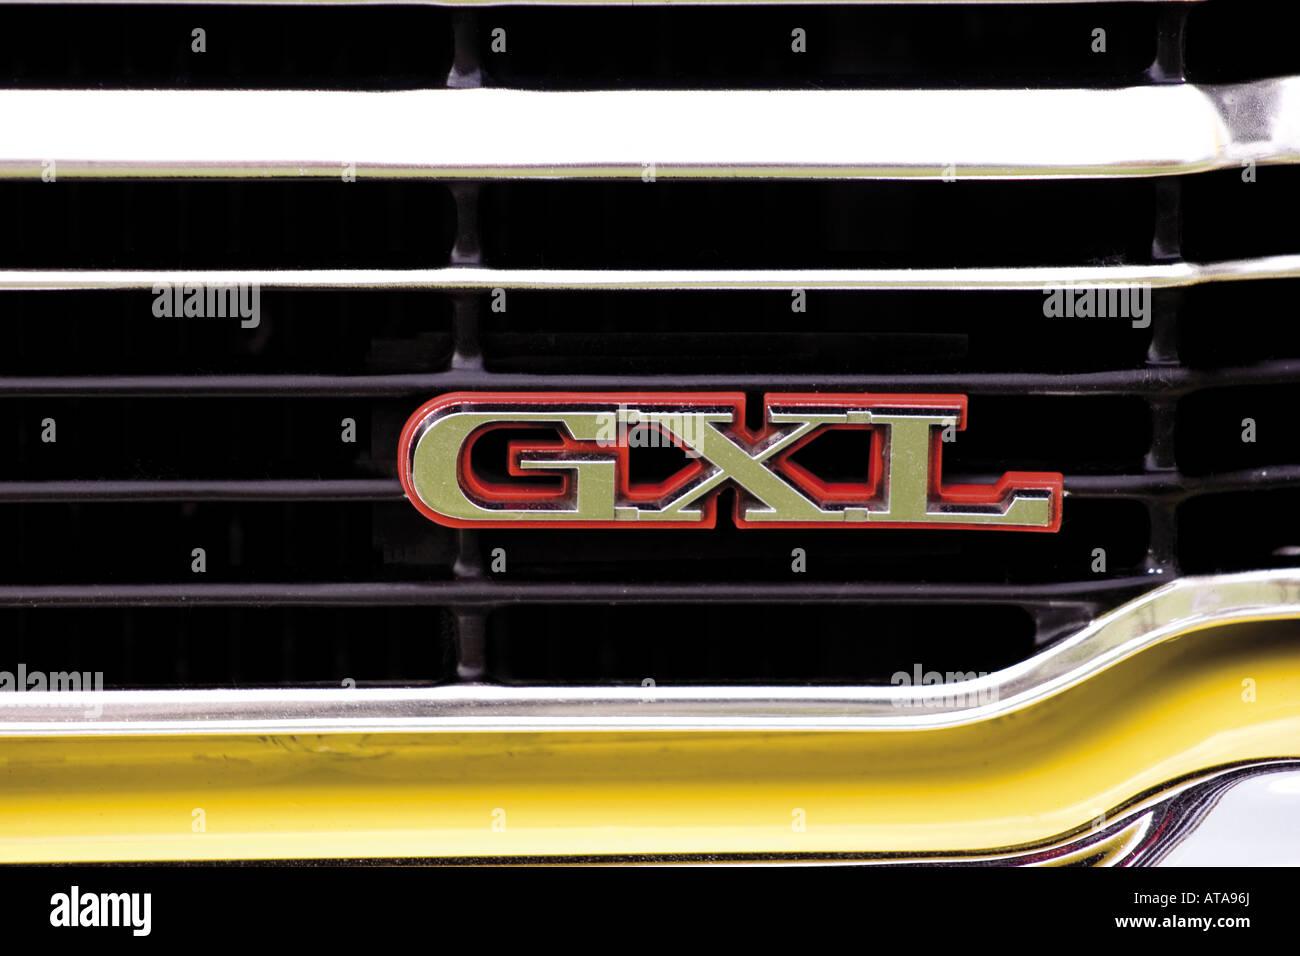 Ford Cortina mk3 mark III three yellow detail badge logo GXL on grille radiator chrome black gloss close up - Stock Image